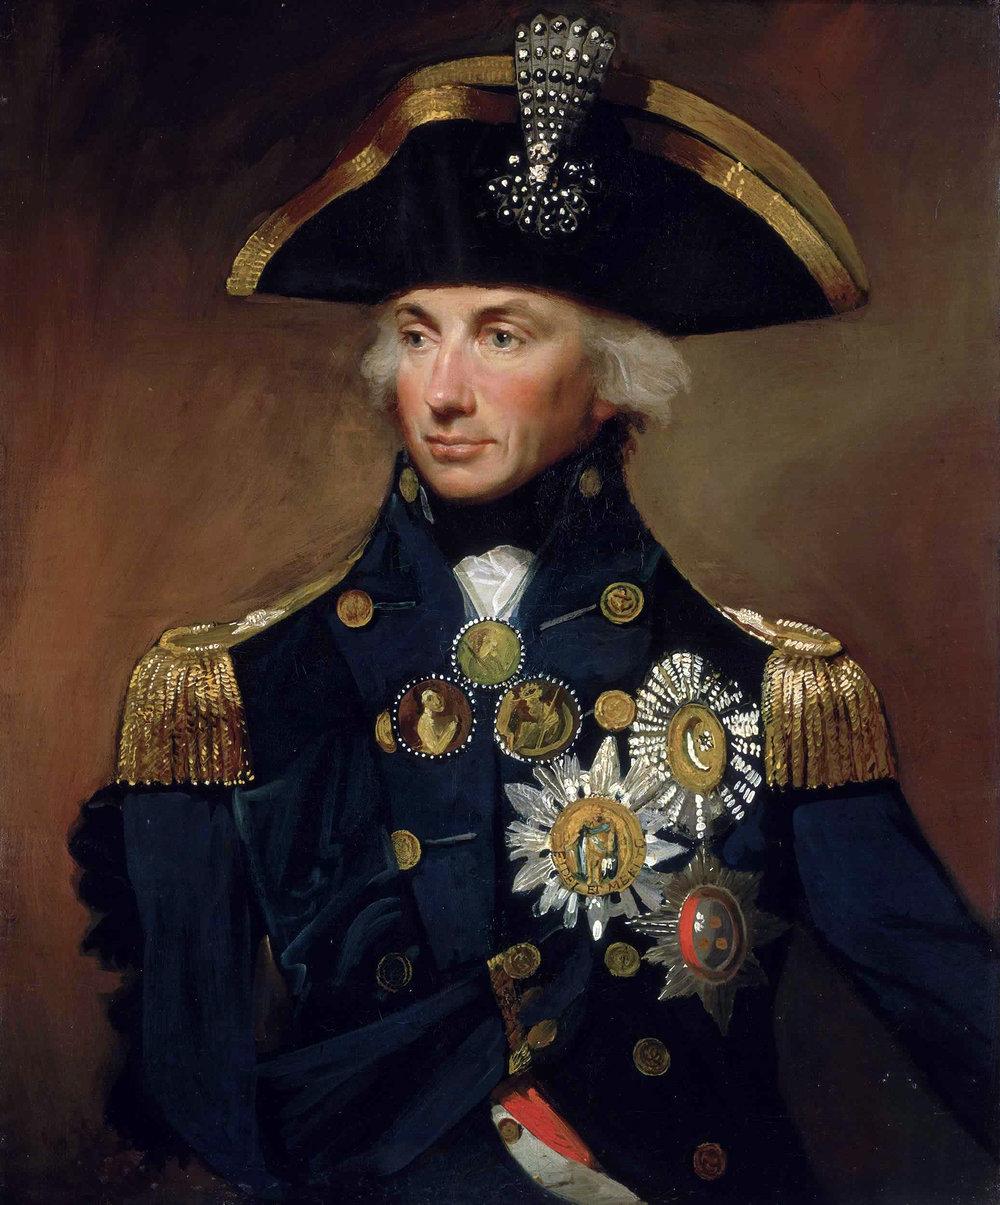 Horatio Nelson, of the Norfolk Nelsons